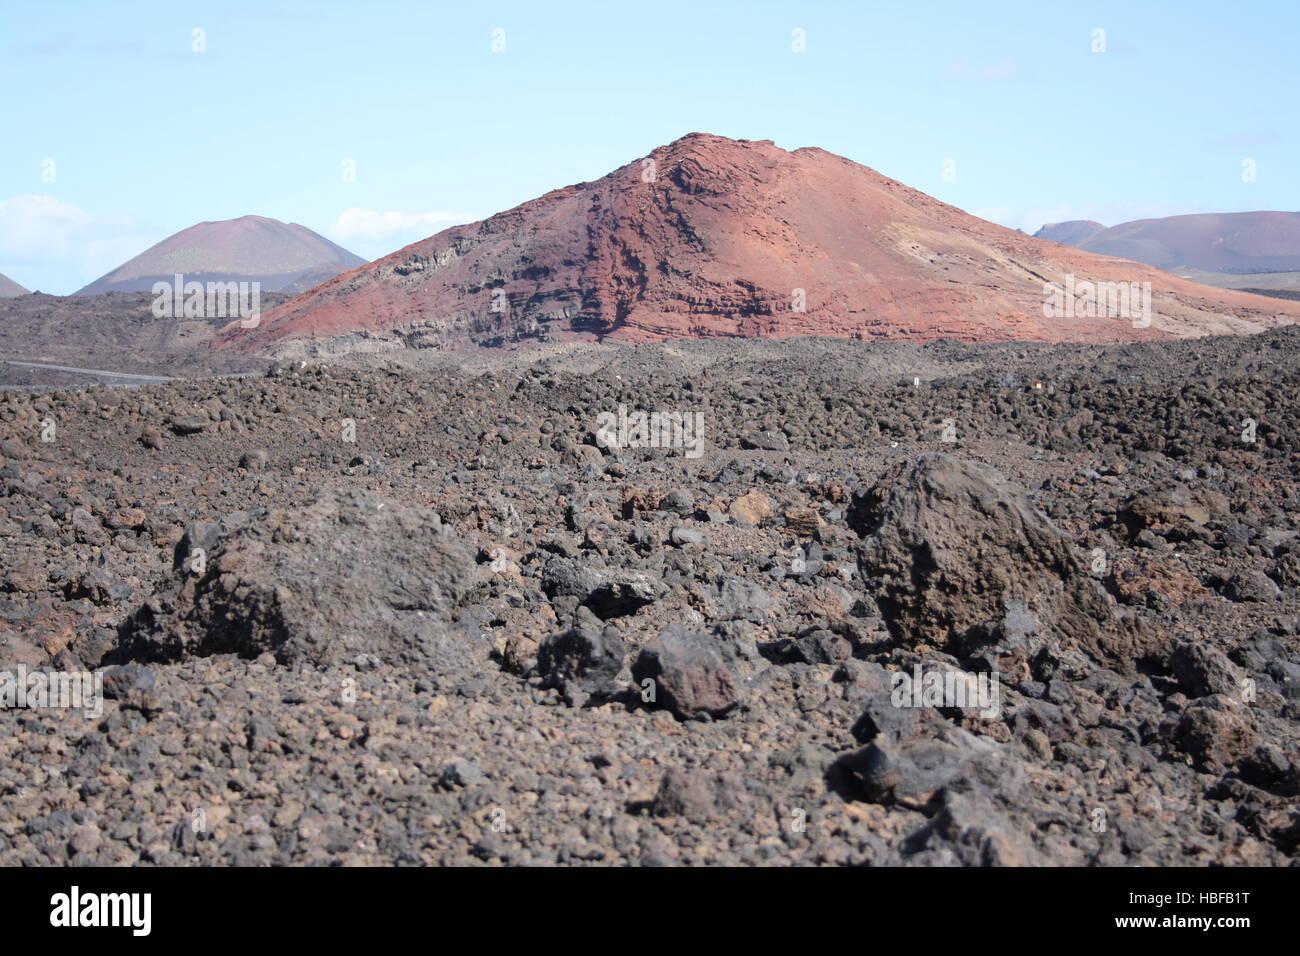 Lanzarote, volcano landscape with lava - Stock Image